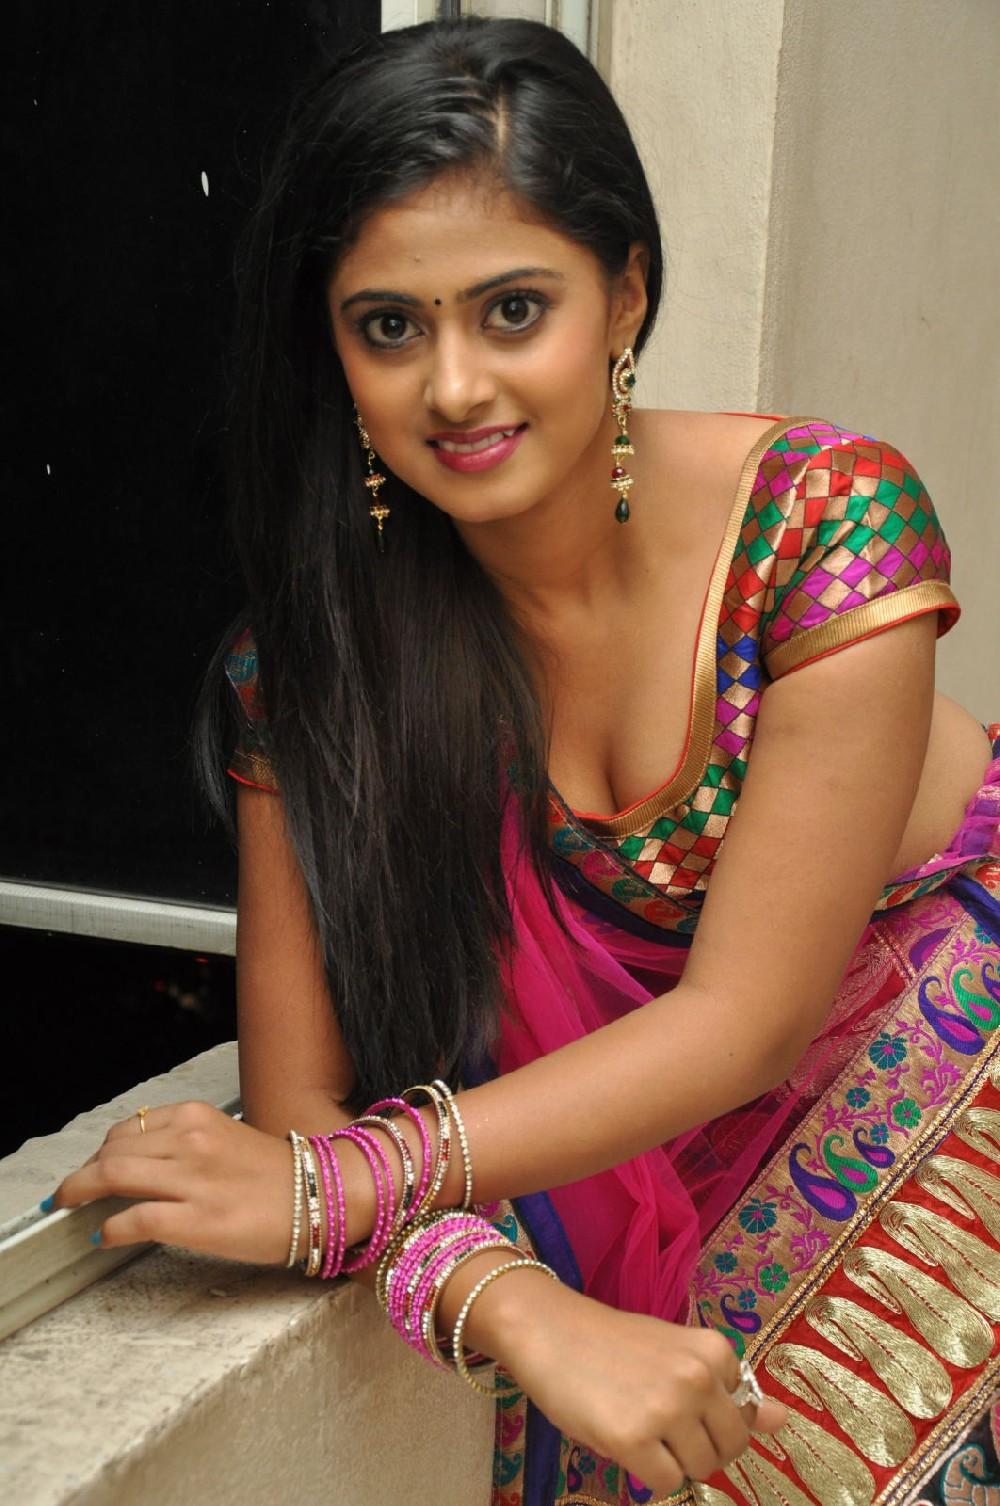 Indian Maid Cleavage Ele cute traditional college girl cleavage show   maalaamaaal